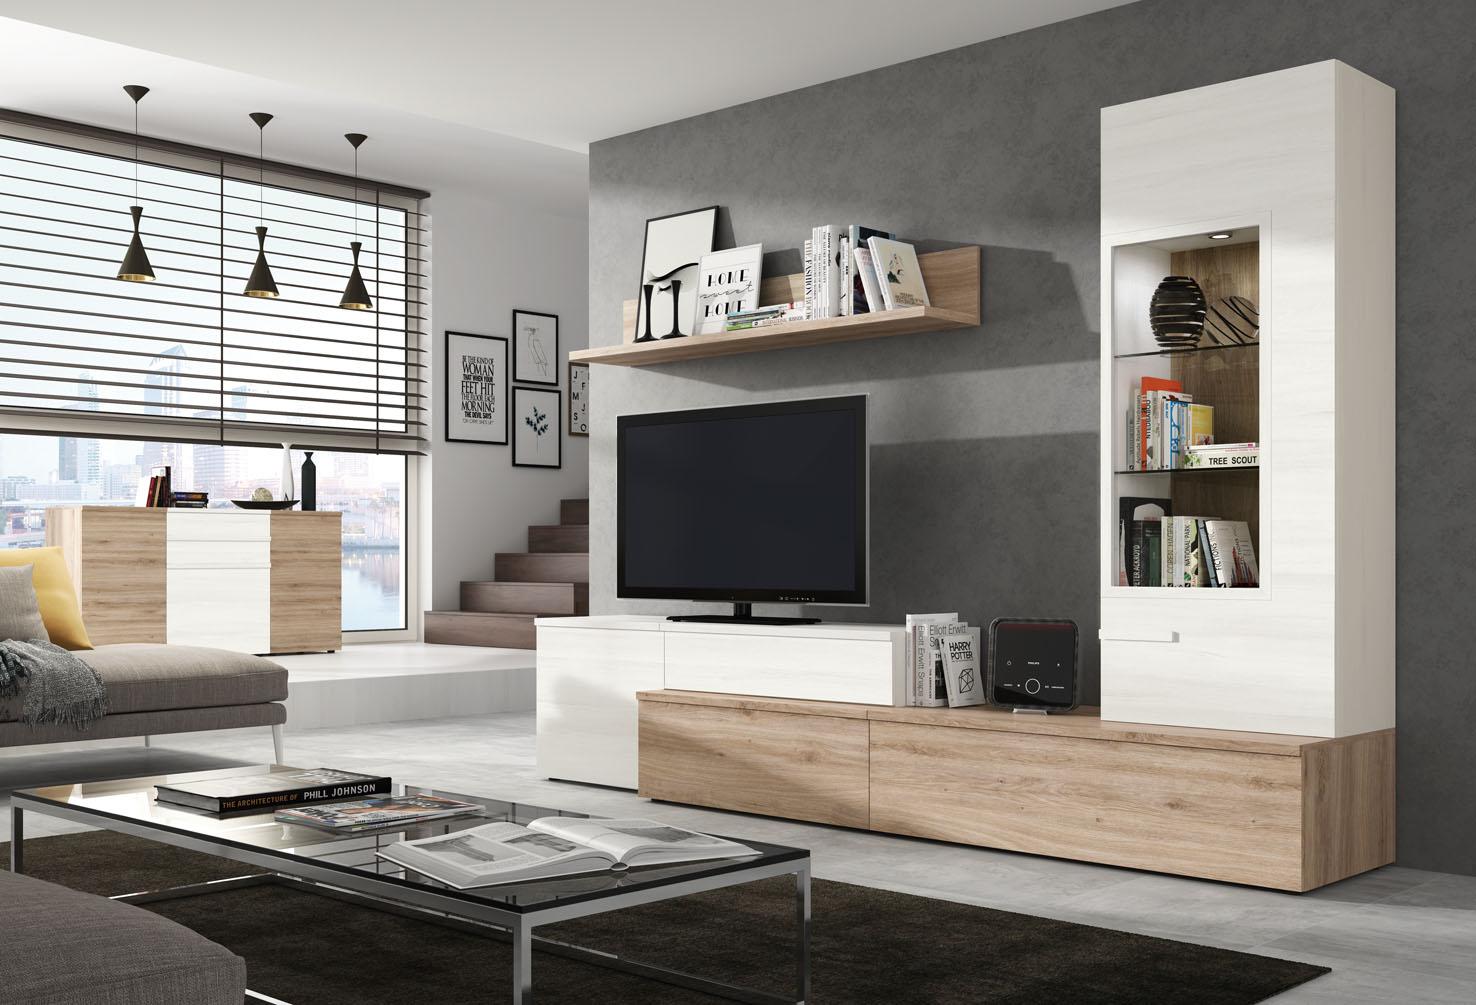 salon-moderno-Neo-2.0-muebles-paco-caballero-907-5d10b30653d39